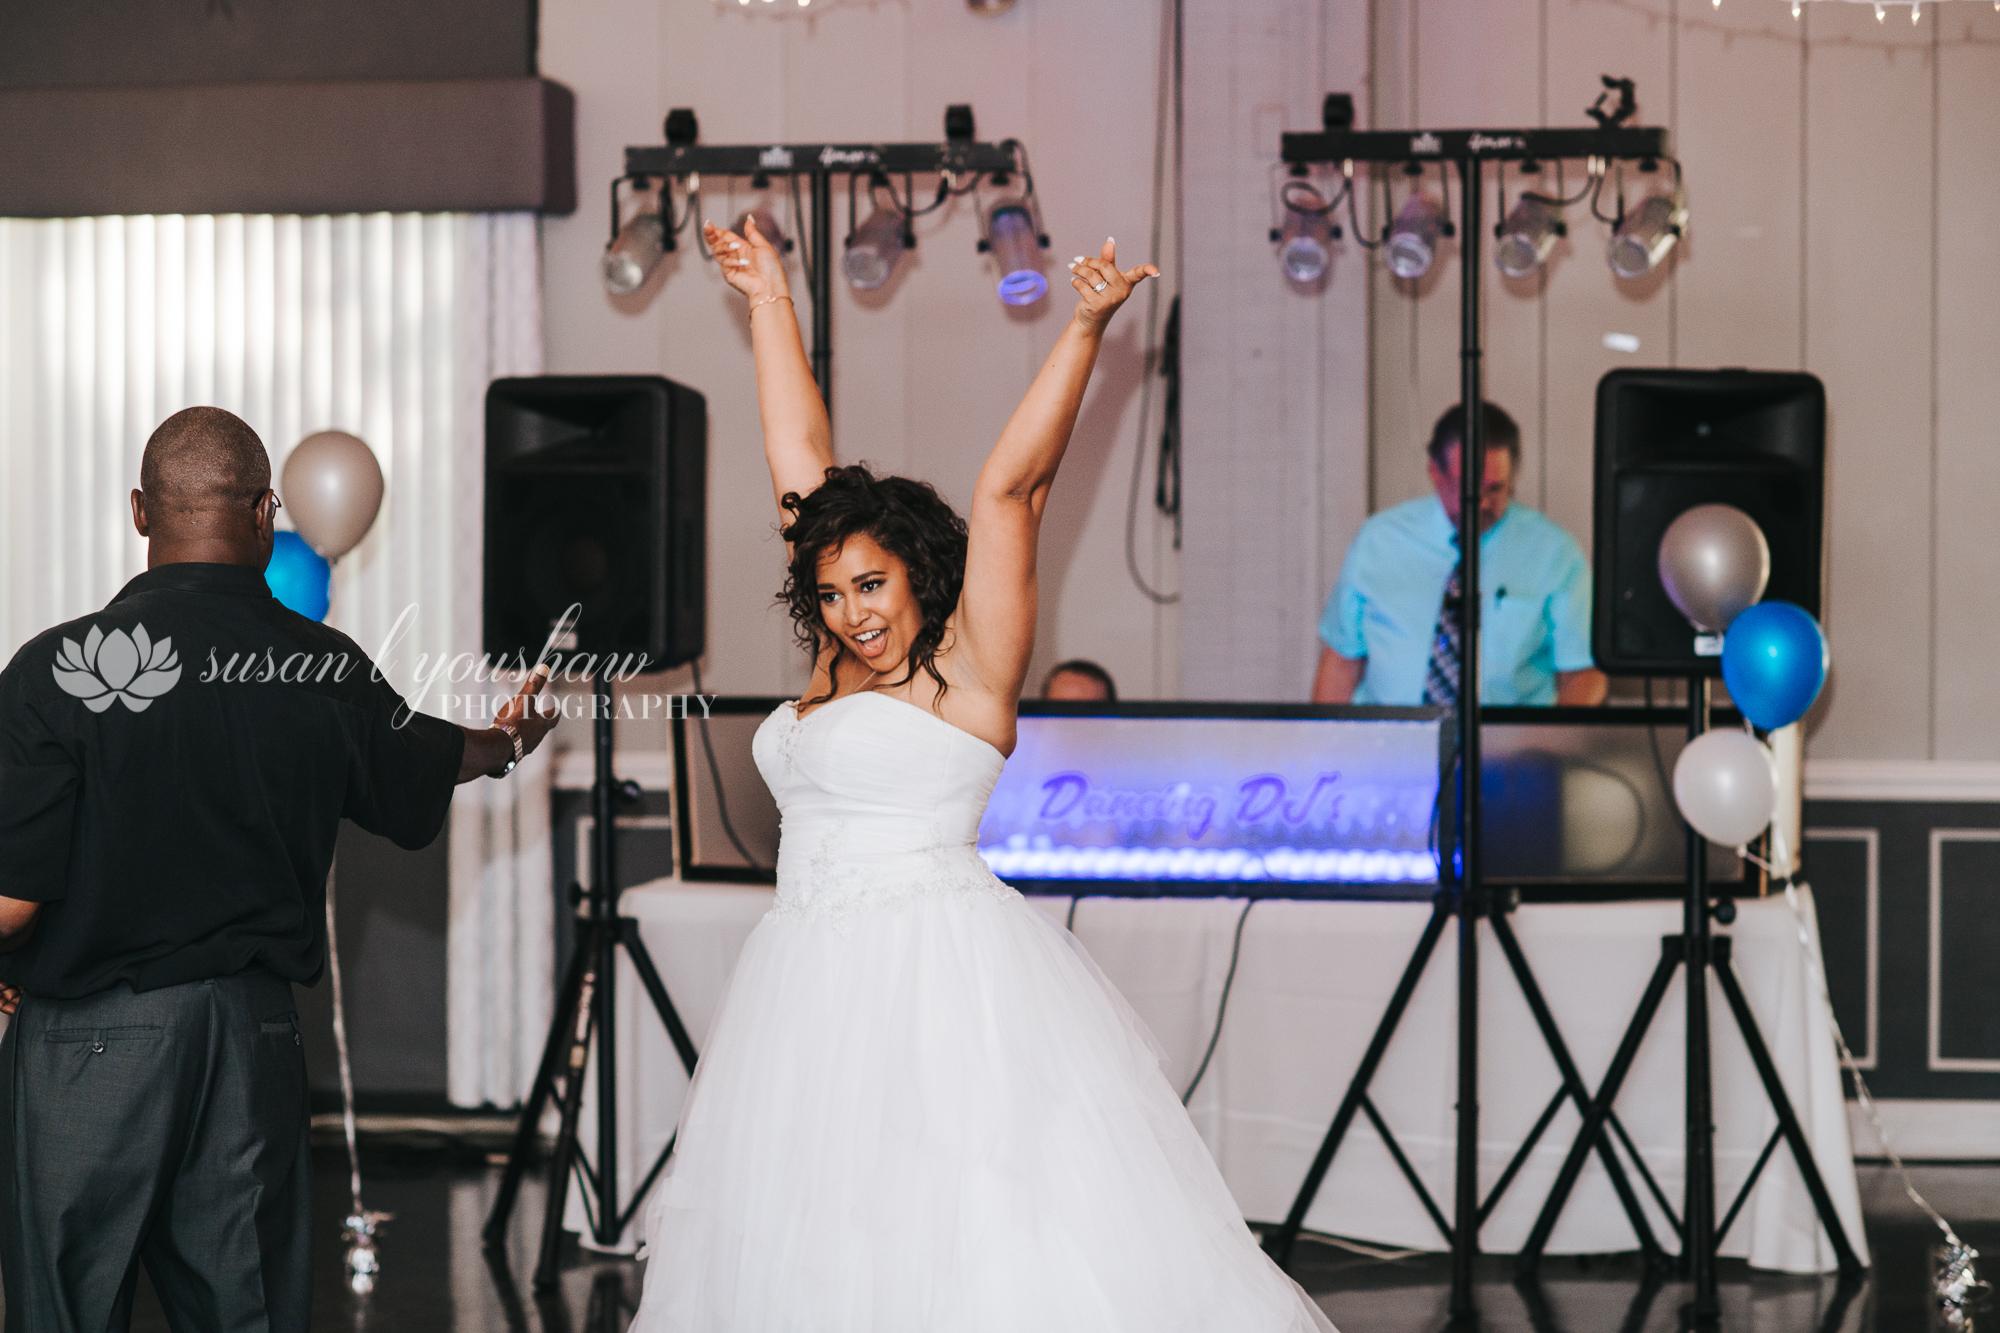 Katelyn and Wes Wedding Photos 07-13-2019 SLY Photography-116.jpg